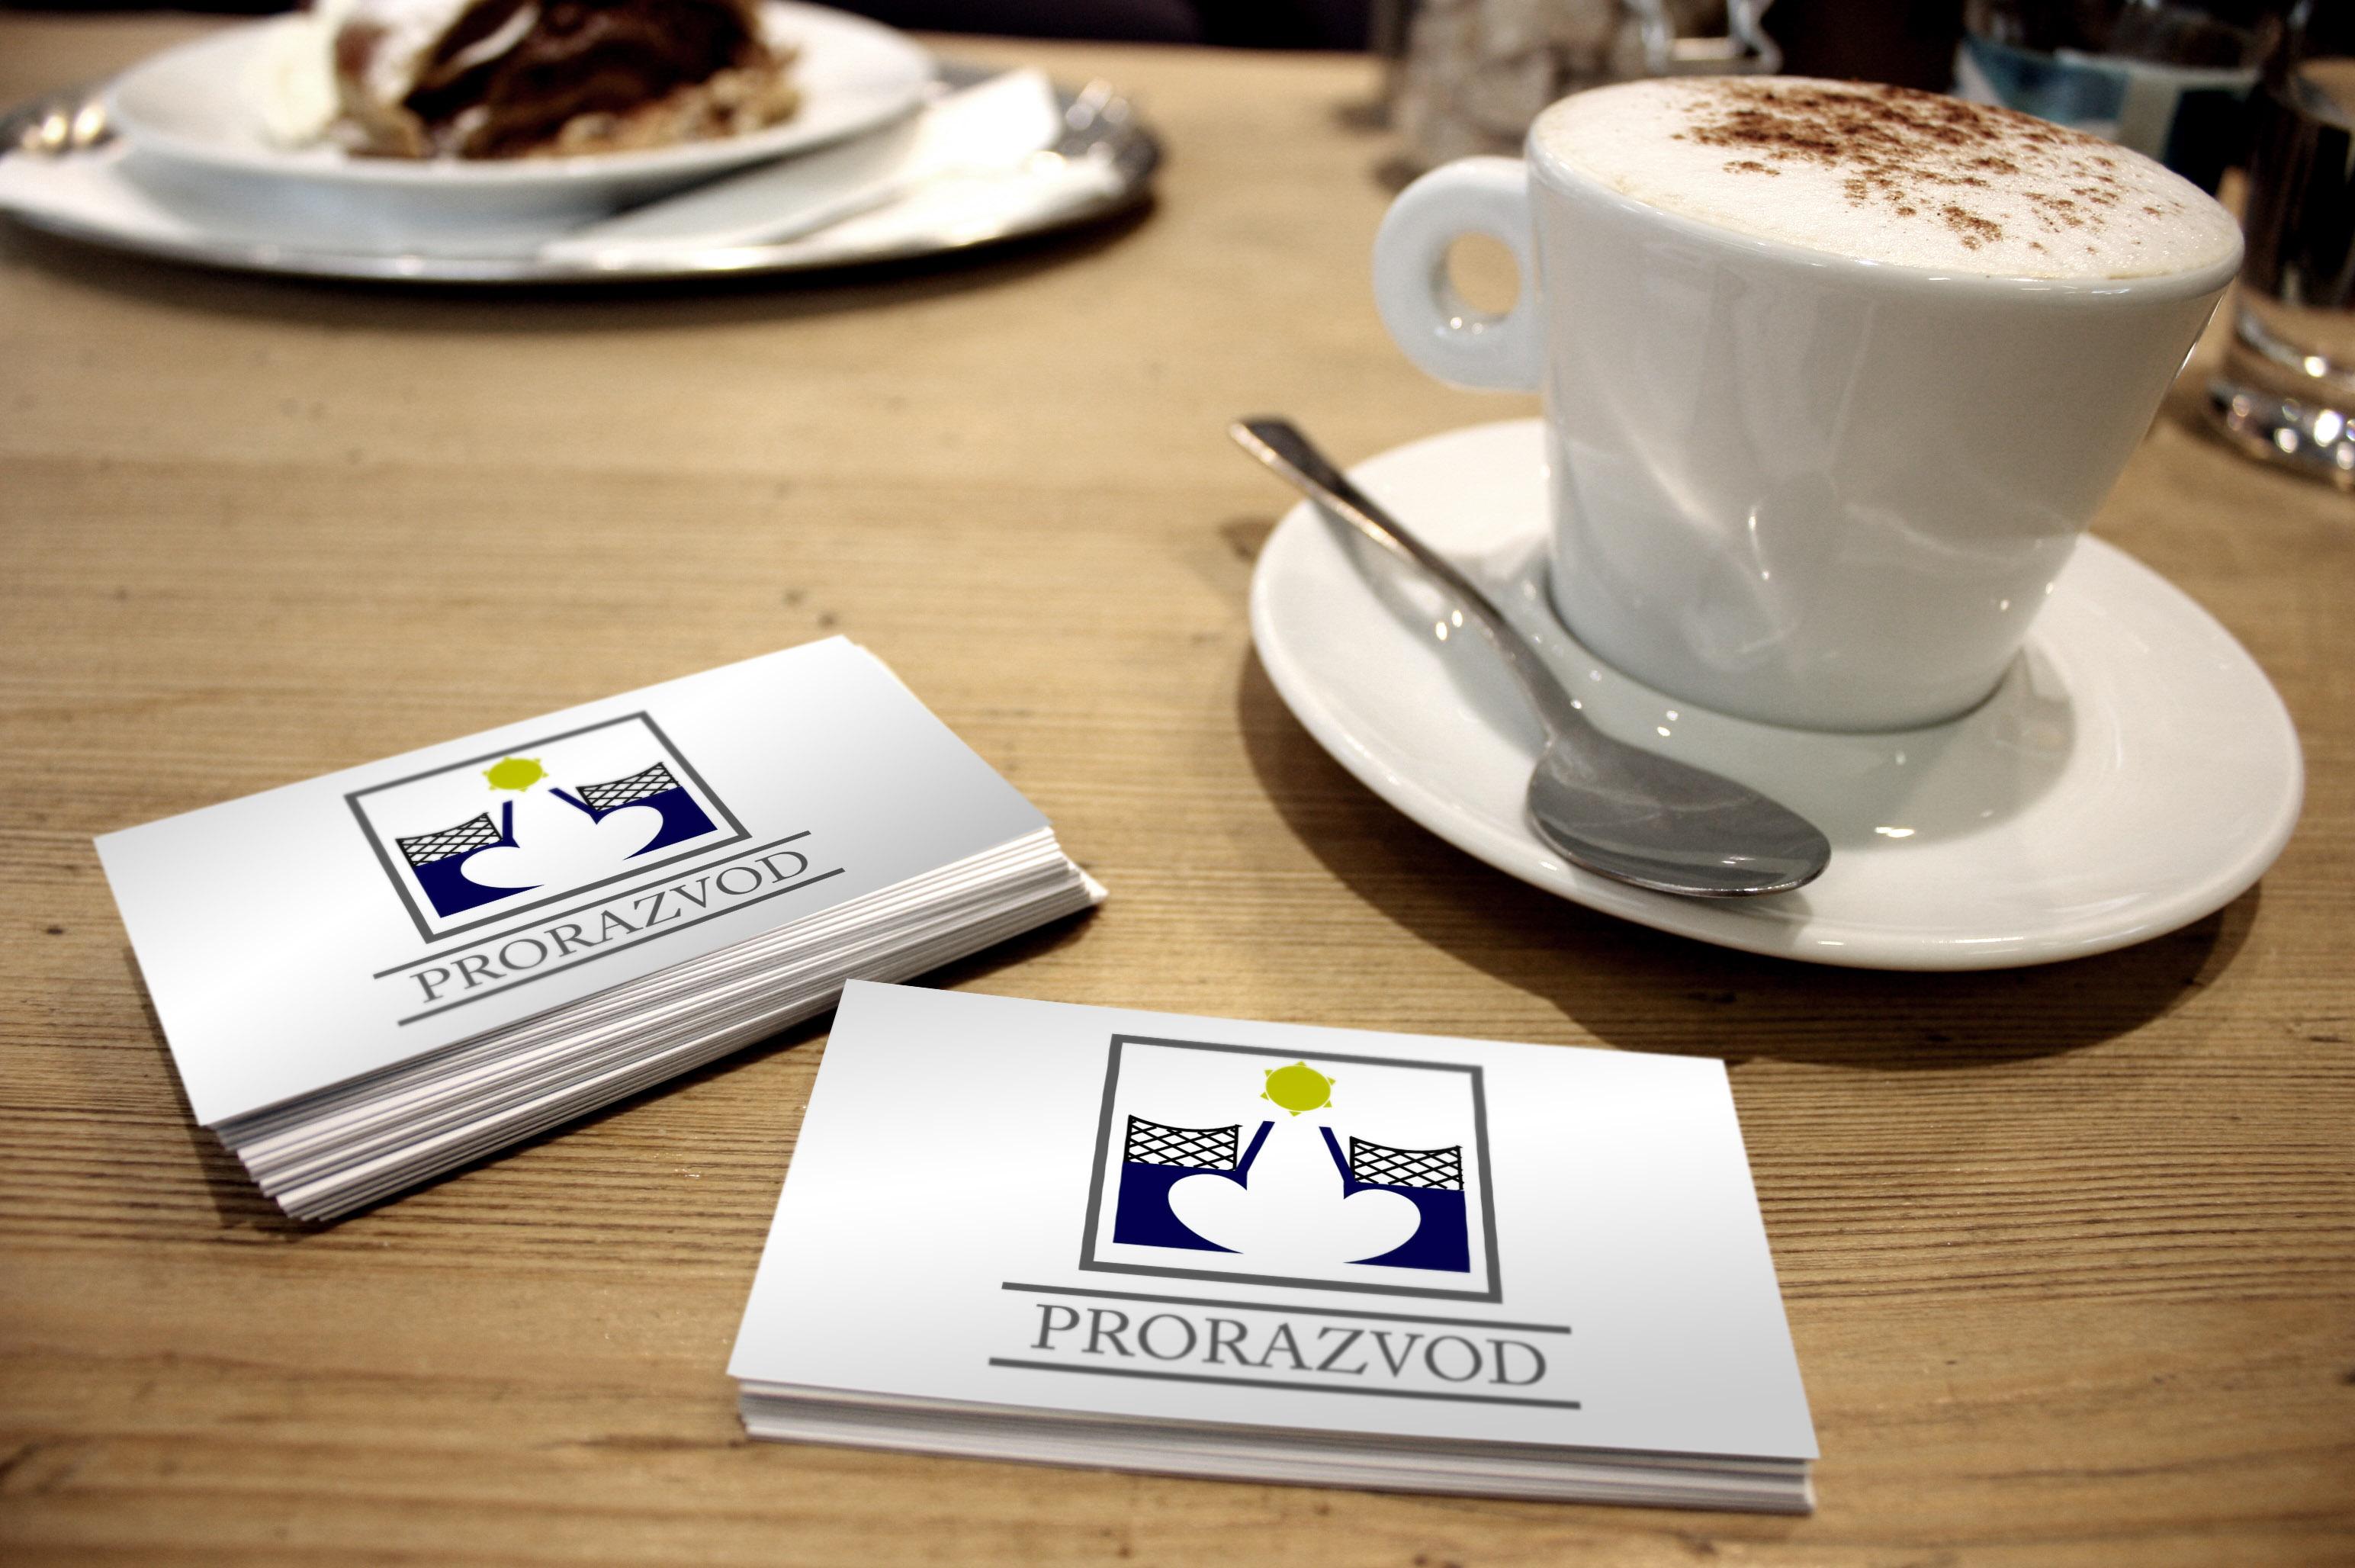 Логотип и фирм стиль для бракоразводного агенства. фото f_188587a8ebacf364.jpg